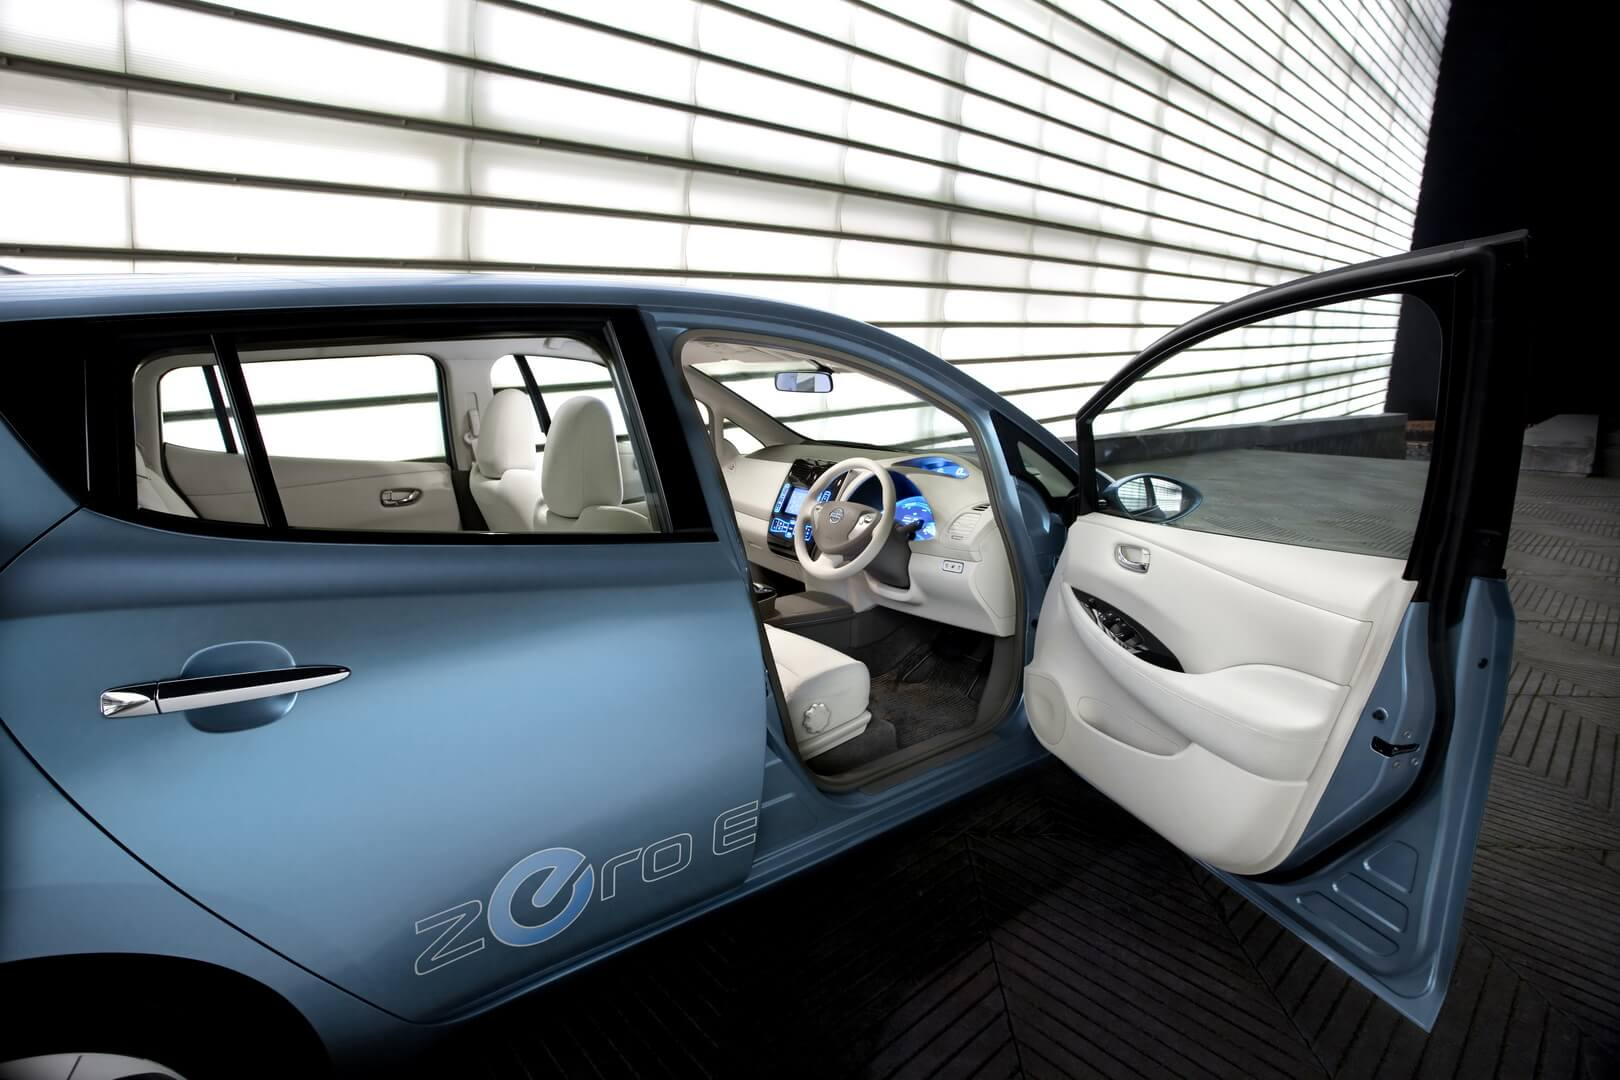 Фотография экоавто Nissan Leaf 2010 (24 кВт•ч) - фото 6